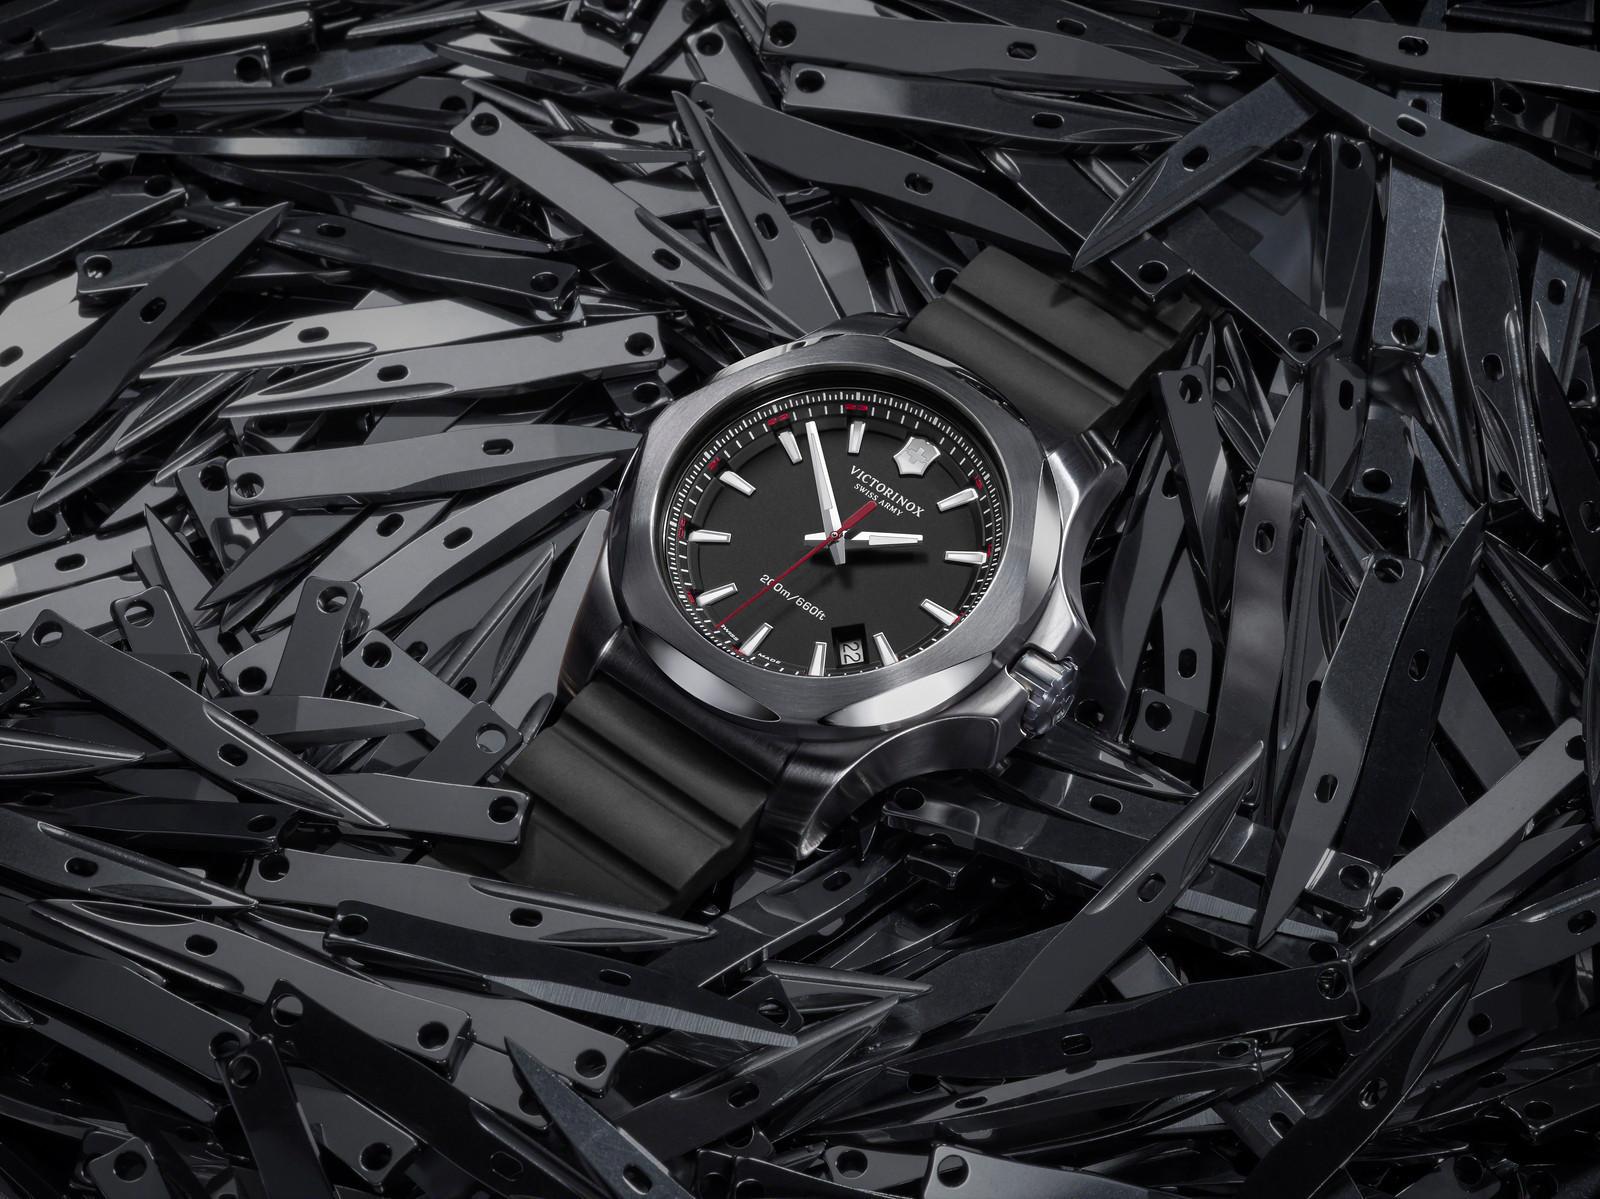 Victorinox-Inox-blades.jpg